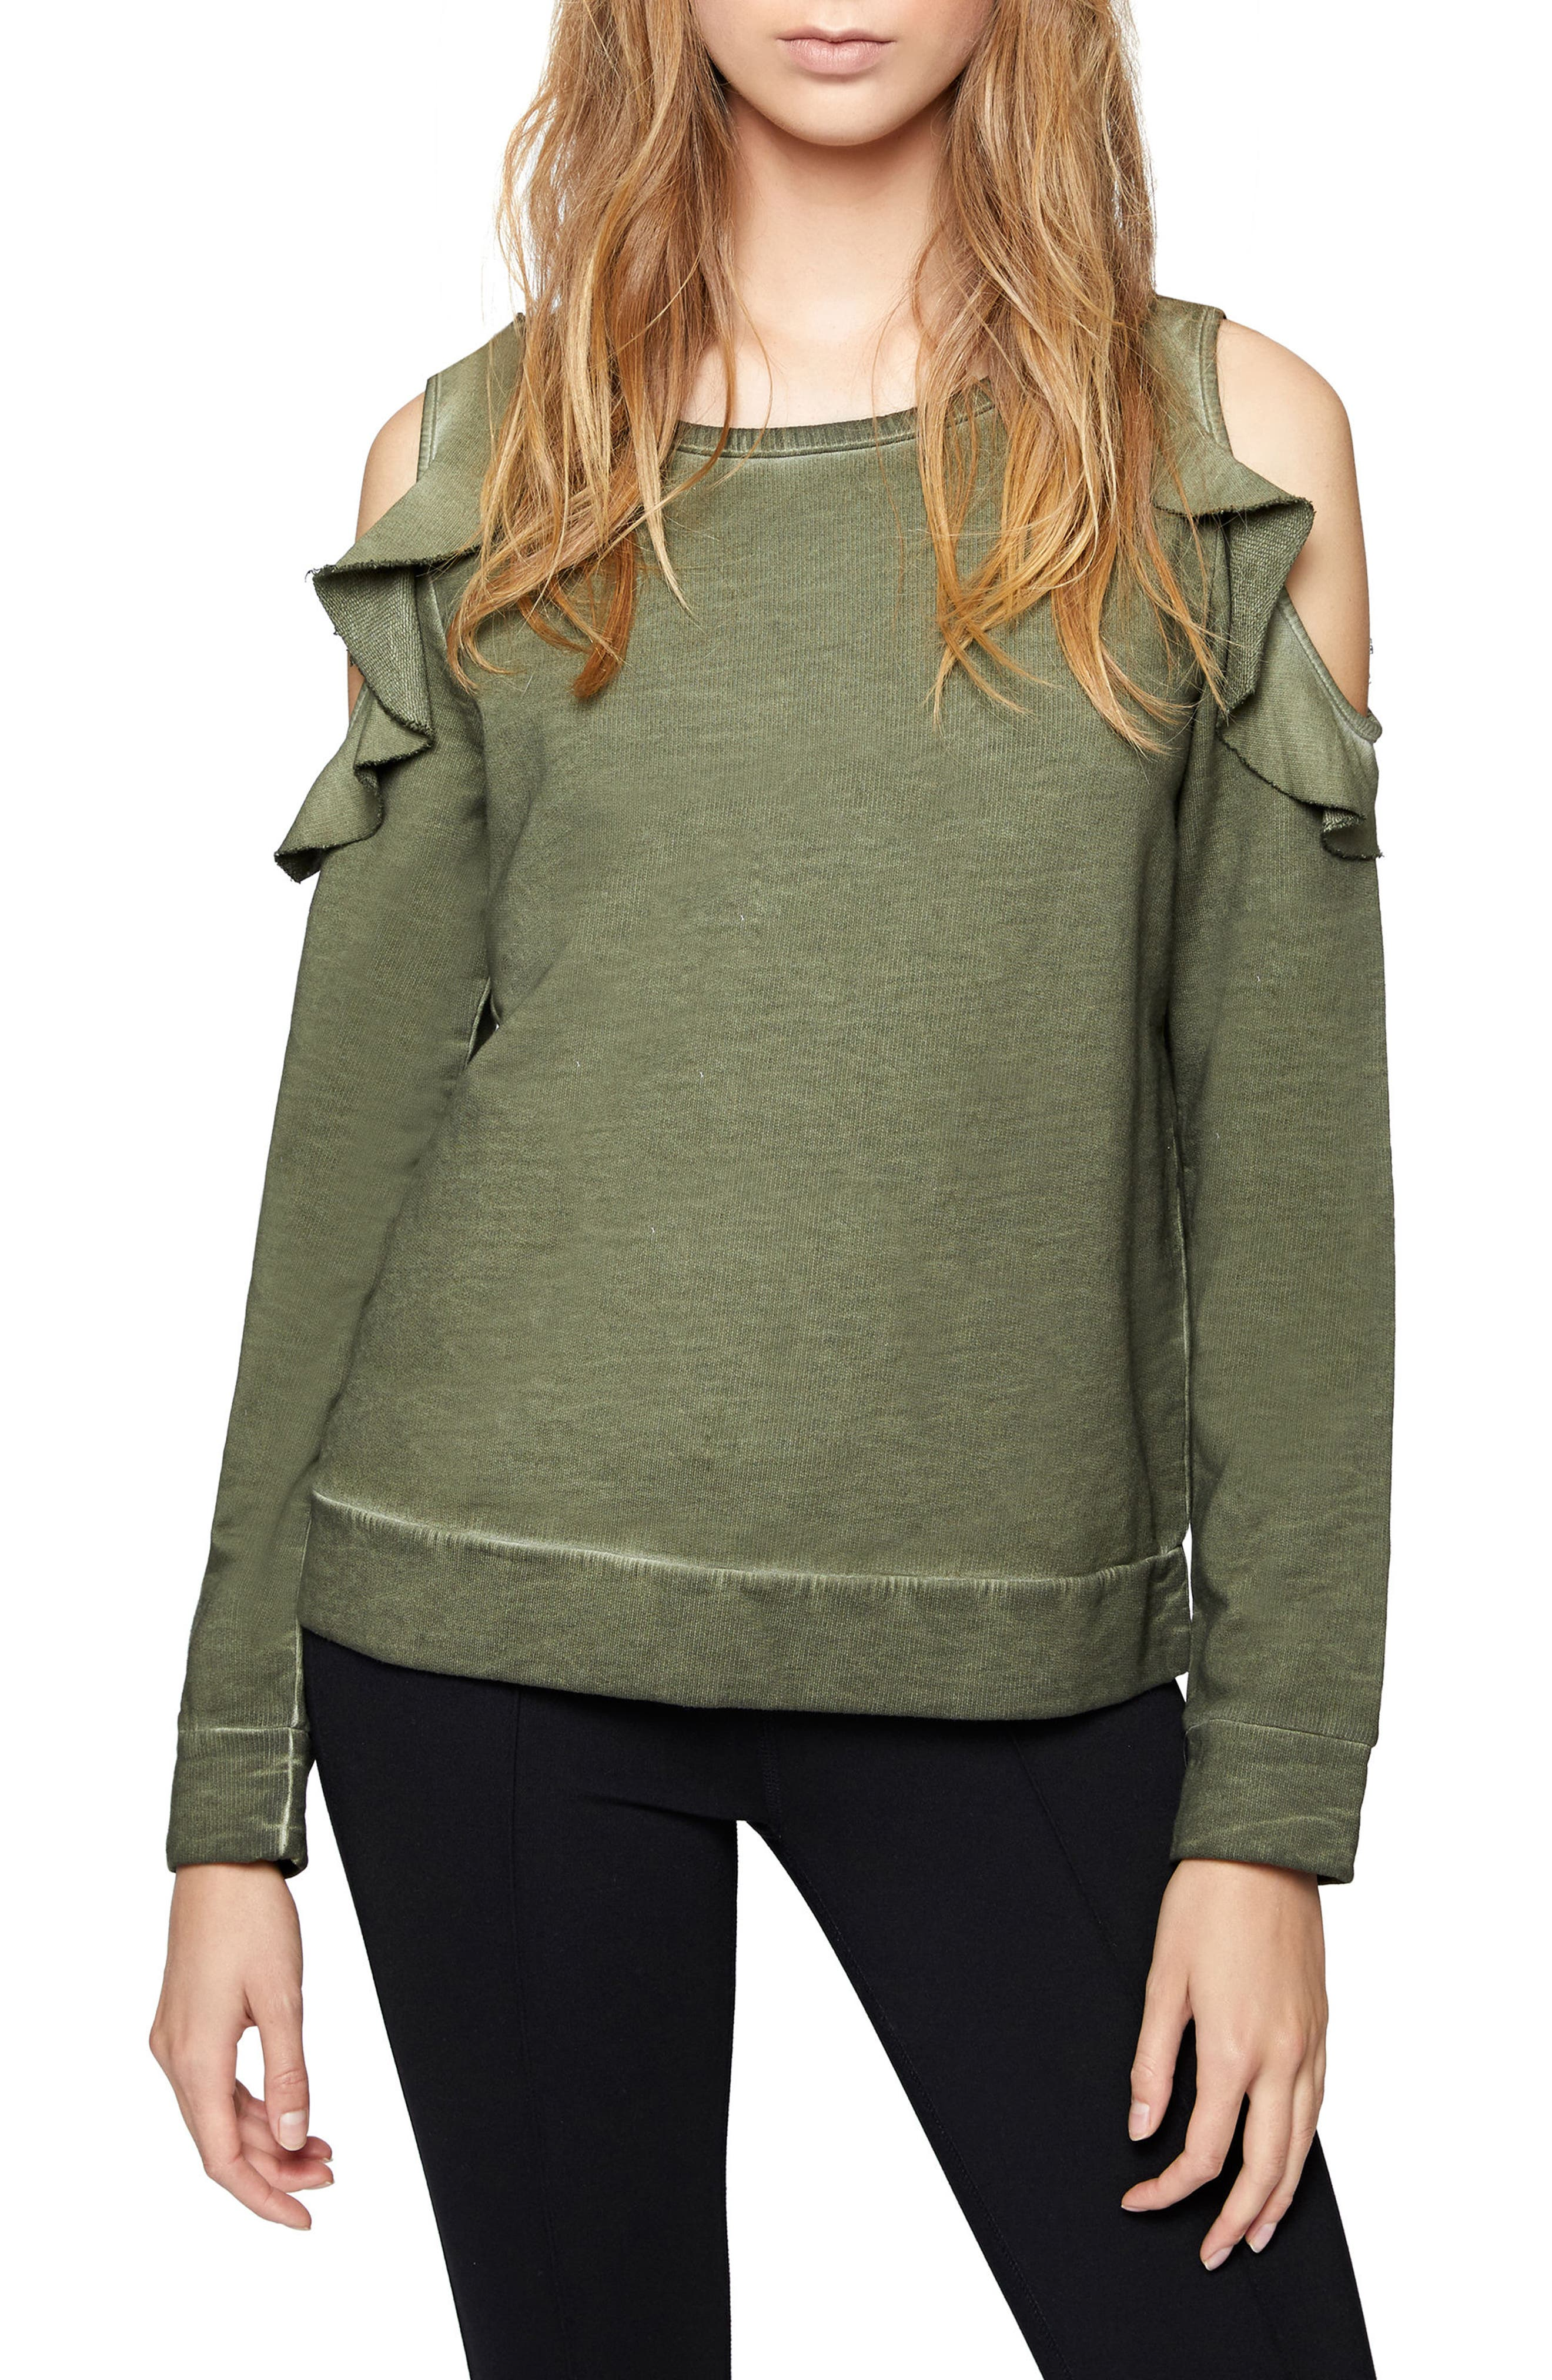 Main Image - Sanctuary Ashley Bare Ruffle Sweatshirt